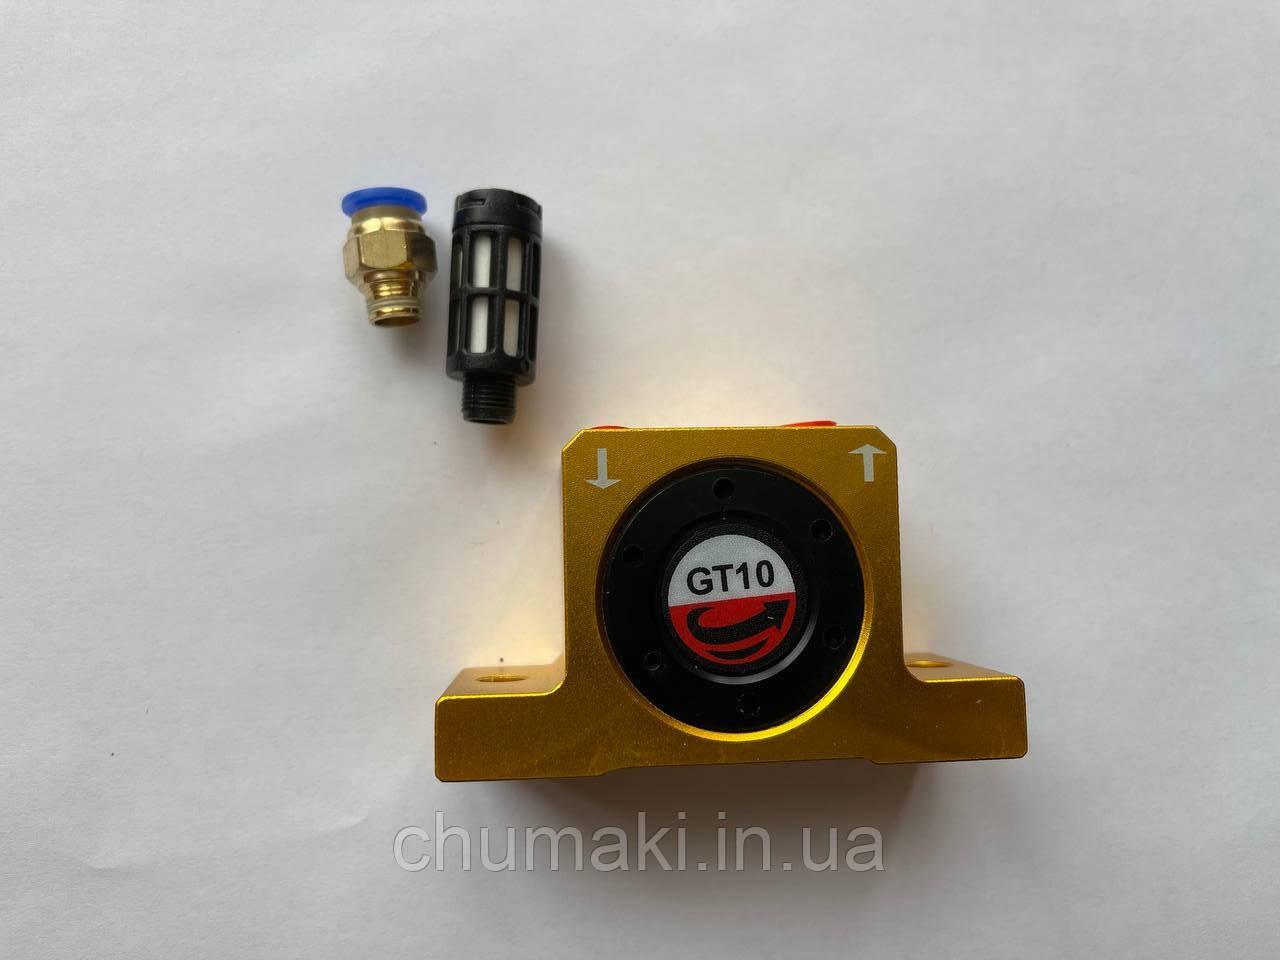 Пневмовибратор турбинный GT-10